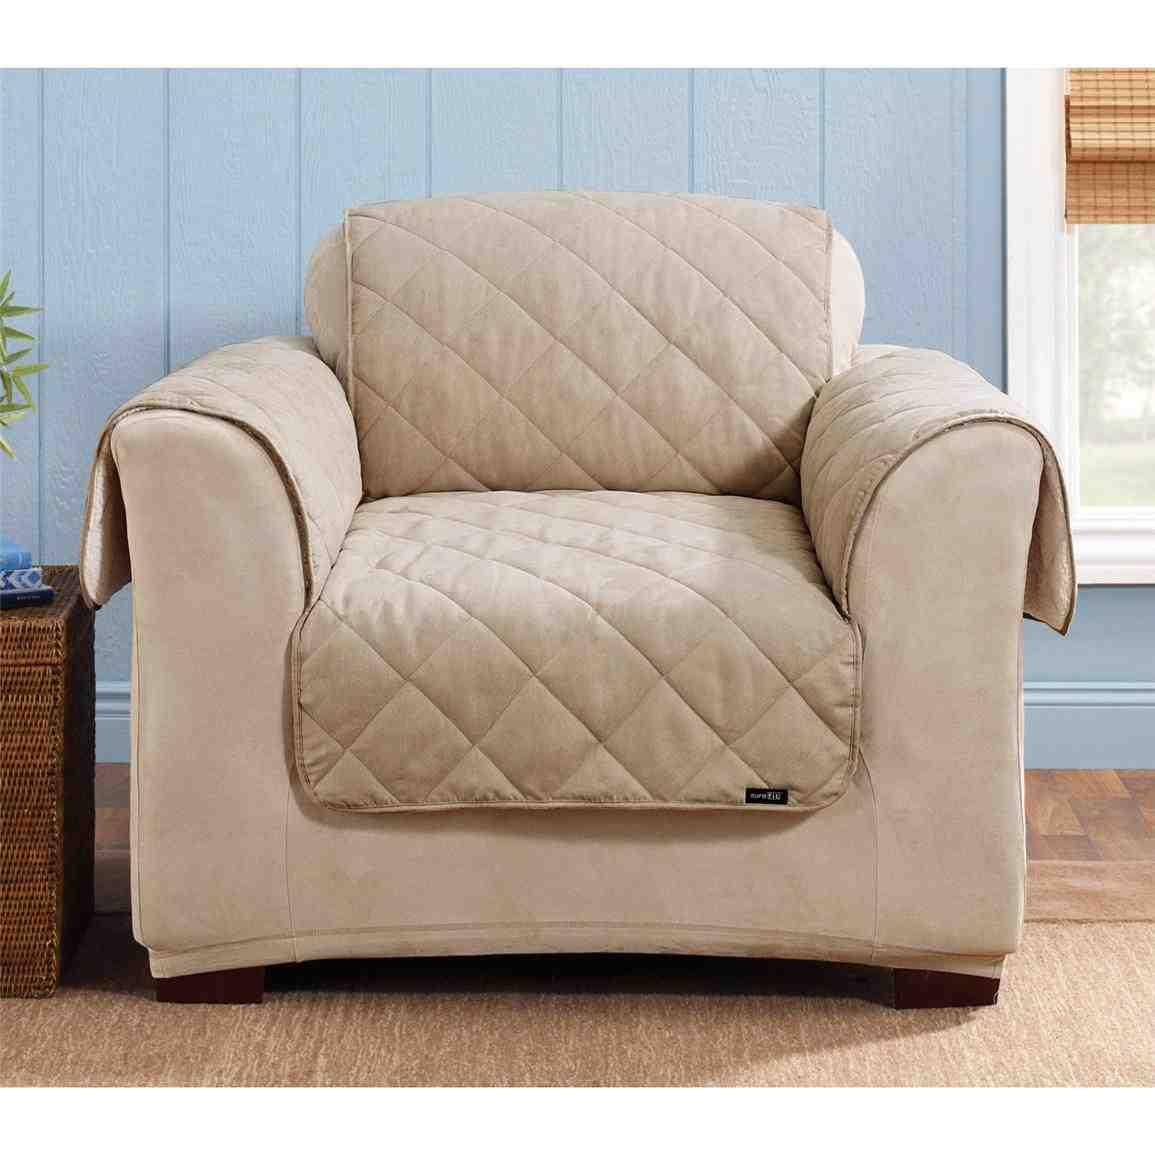 Sure Fit Pet Sofa Cover Home Furniture Design